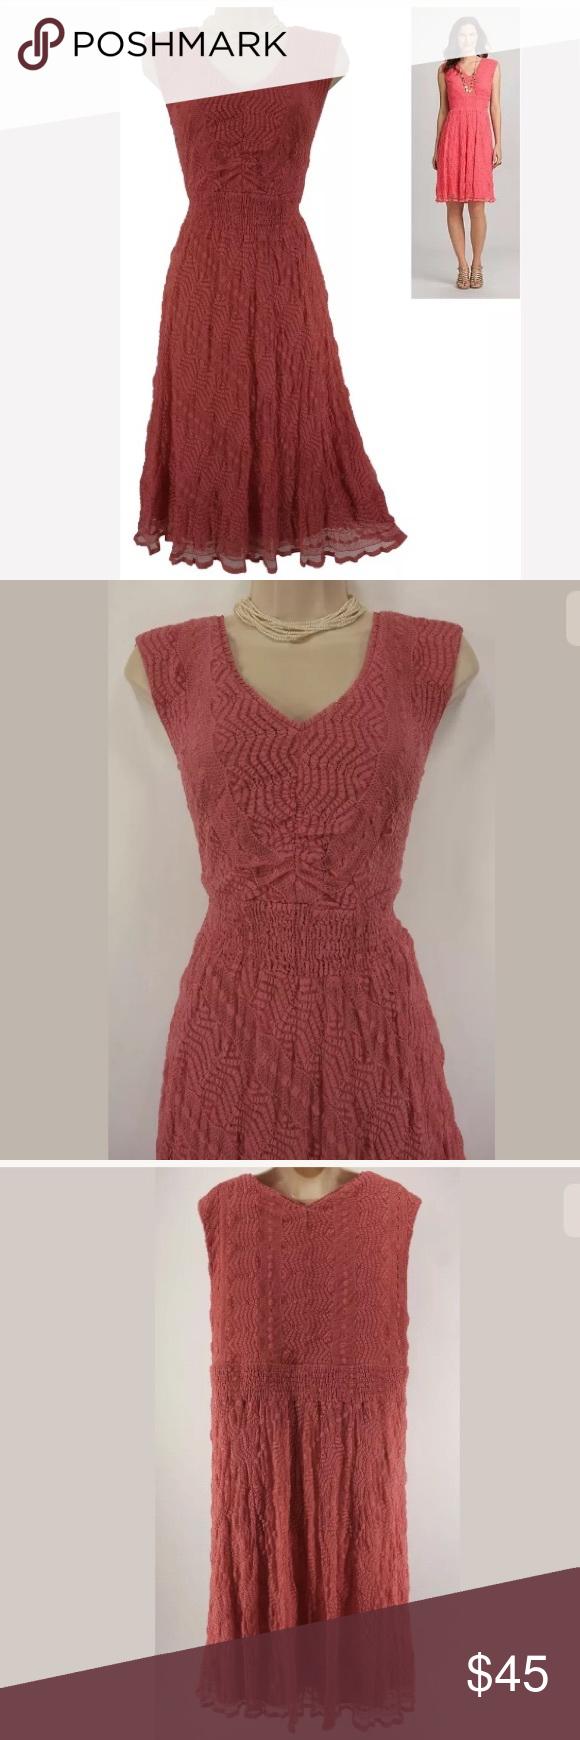 20w 2xgorgeous Coral Lace Dress Summer Plus Size Coral Lace